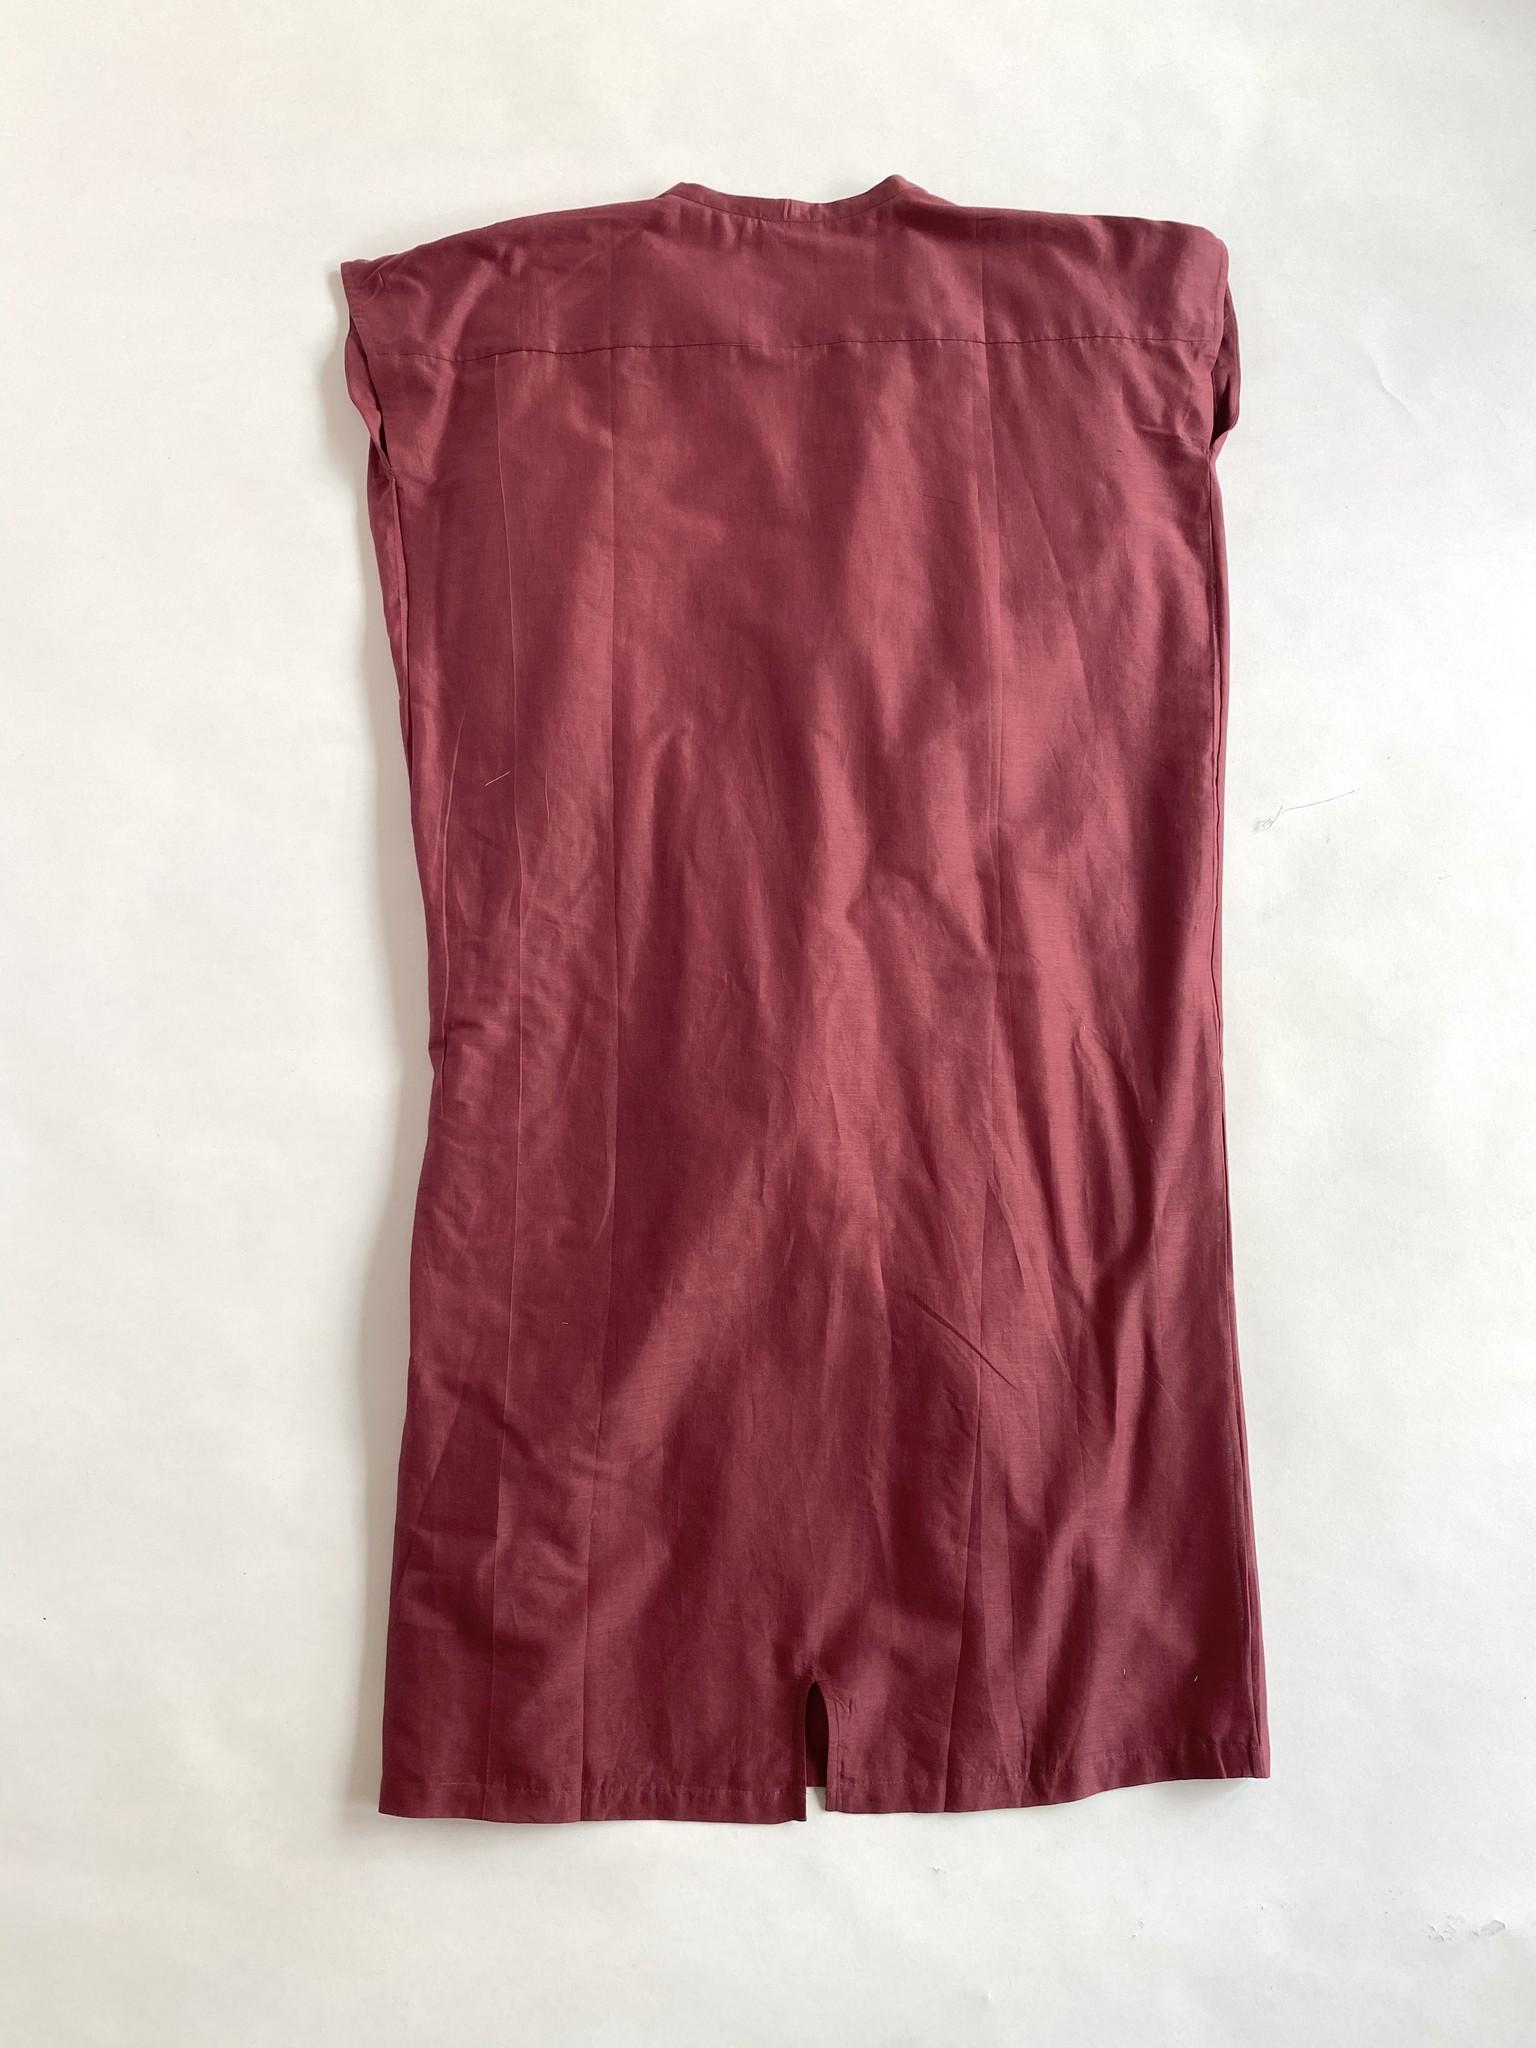 Diega Diega Rega Burgundy Cotton Dress